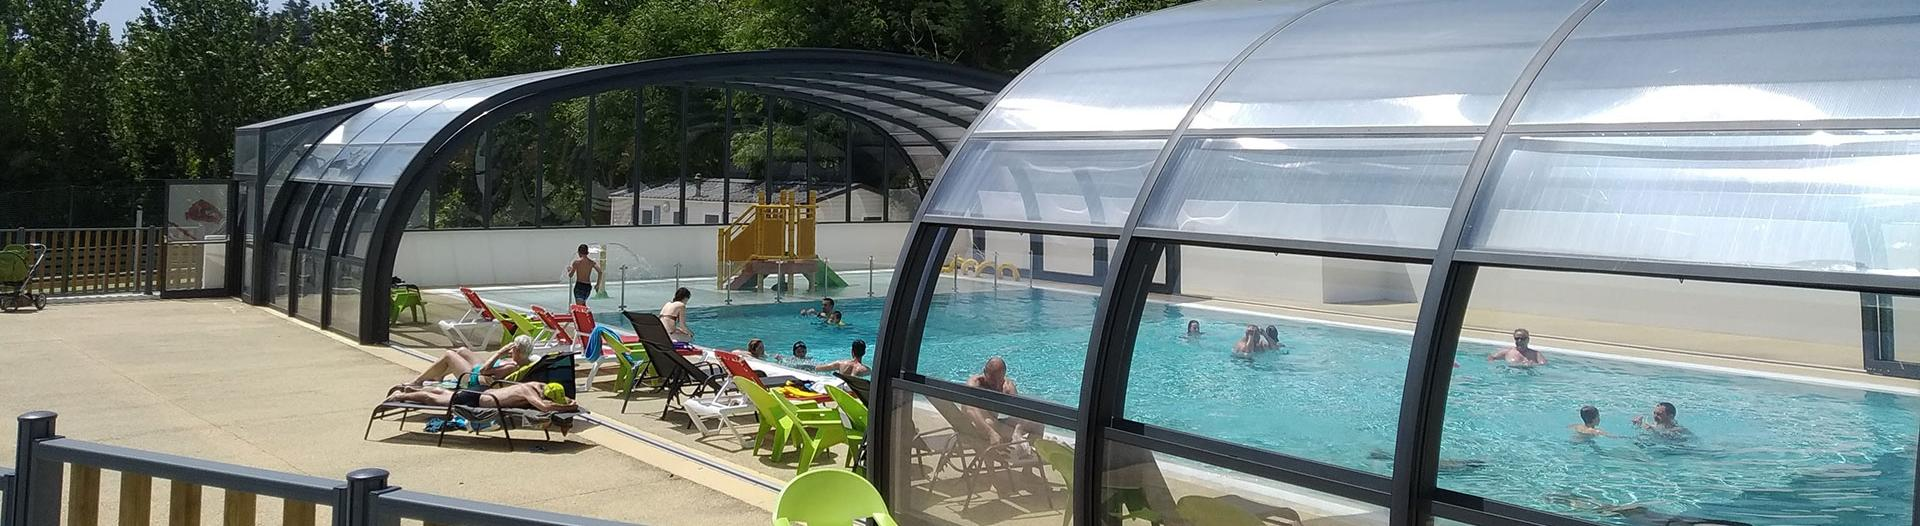 slider-camping-harrobia-piscine